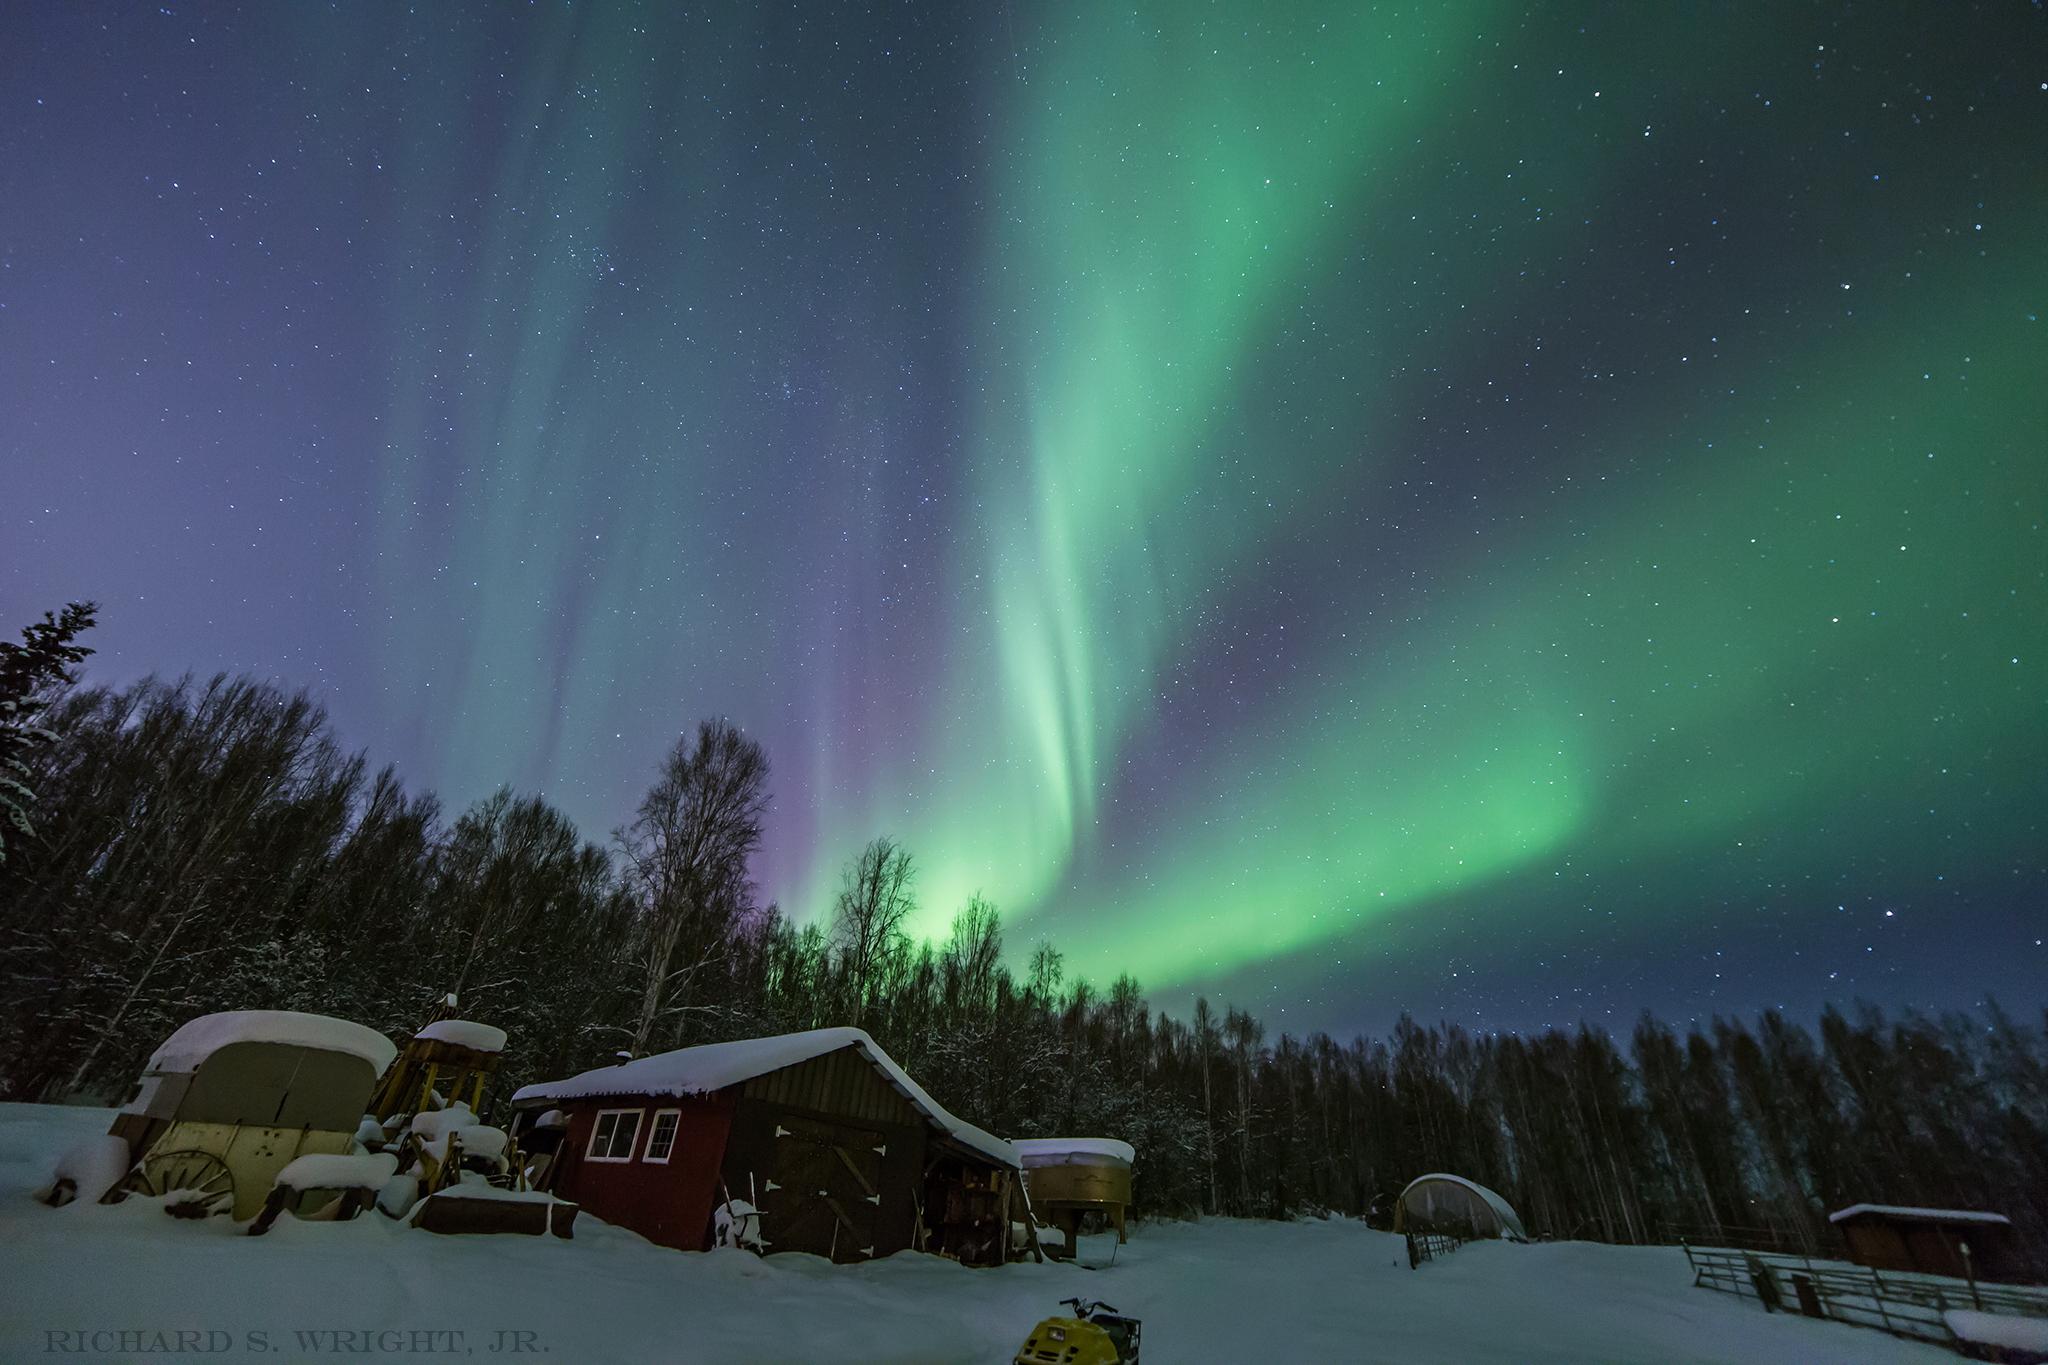 © Aurora Borealis. Photograph by Richard S. Wright, Jr. Fairbanks, Alaska 2015